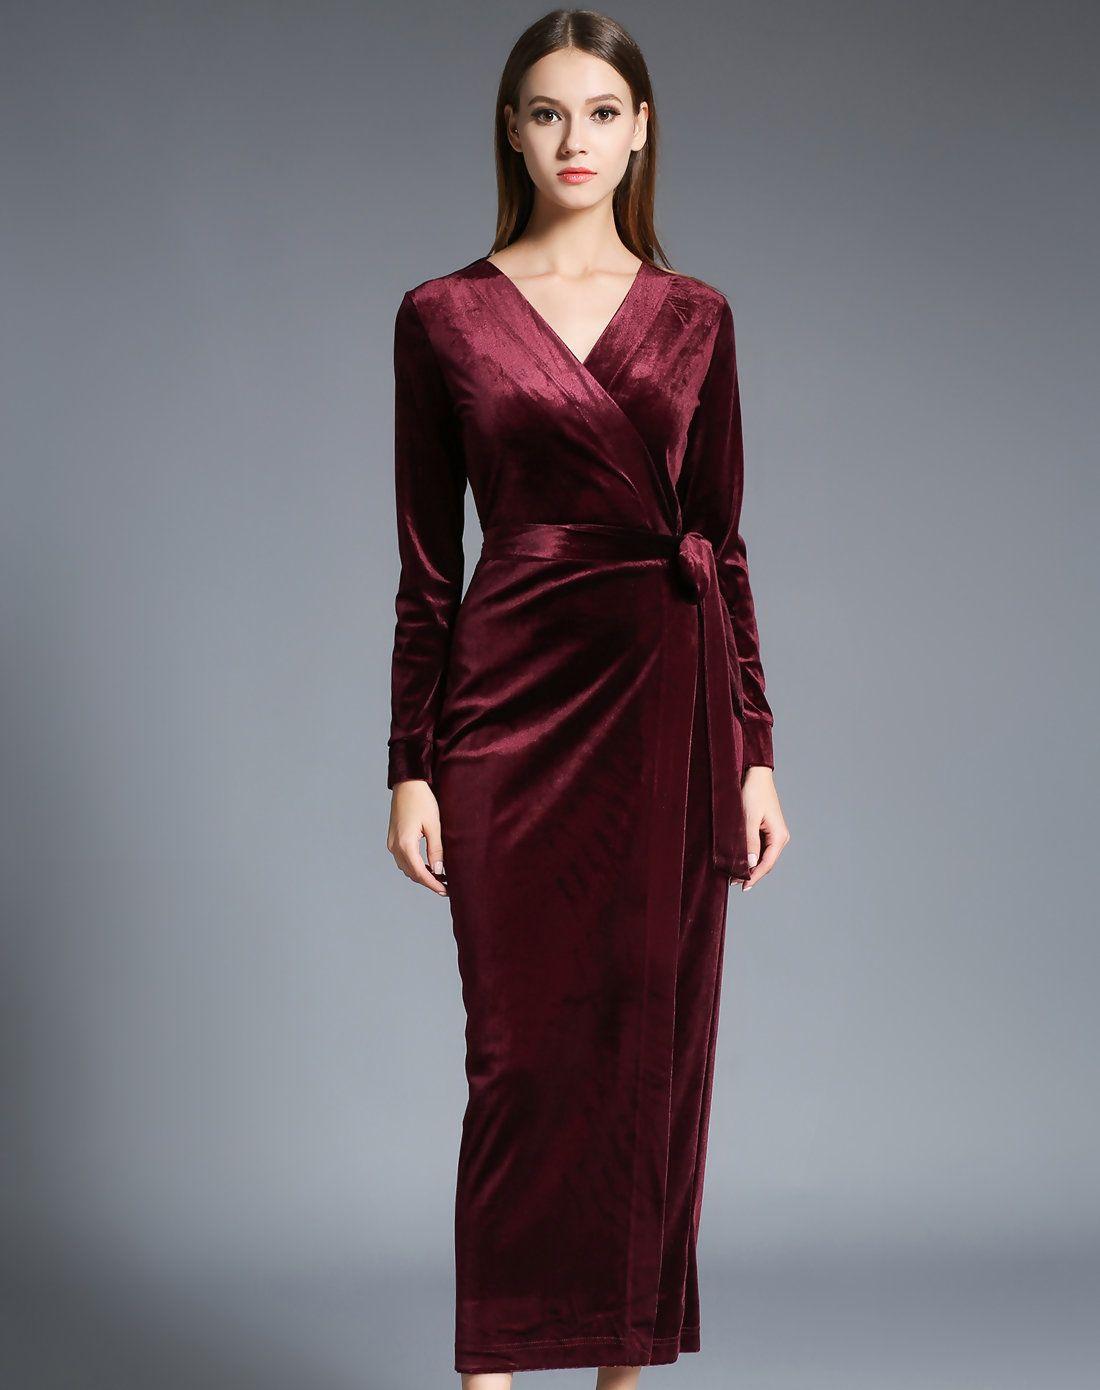 Adorewe fwaysby wine surplice neck long sleeve belted midi dress